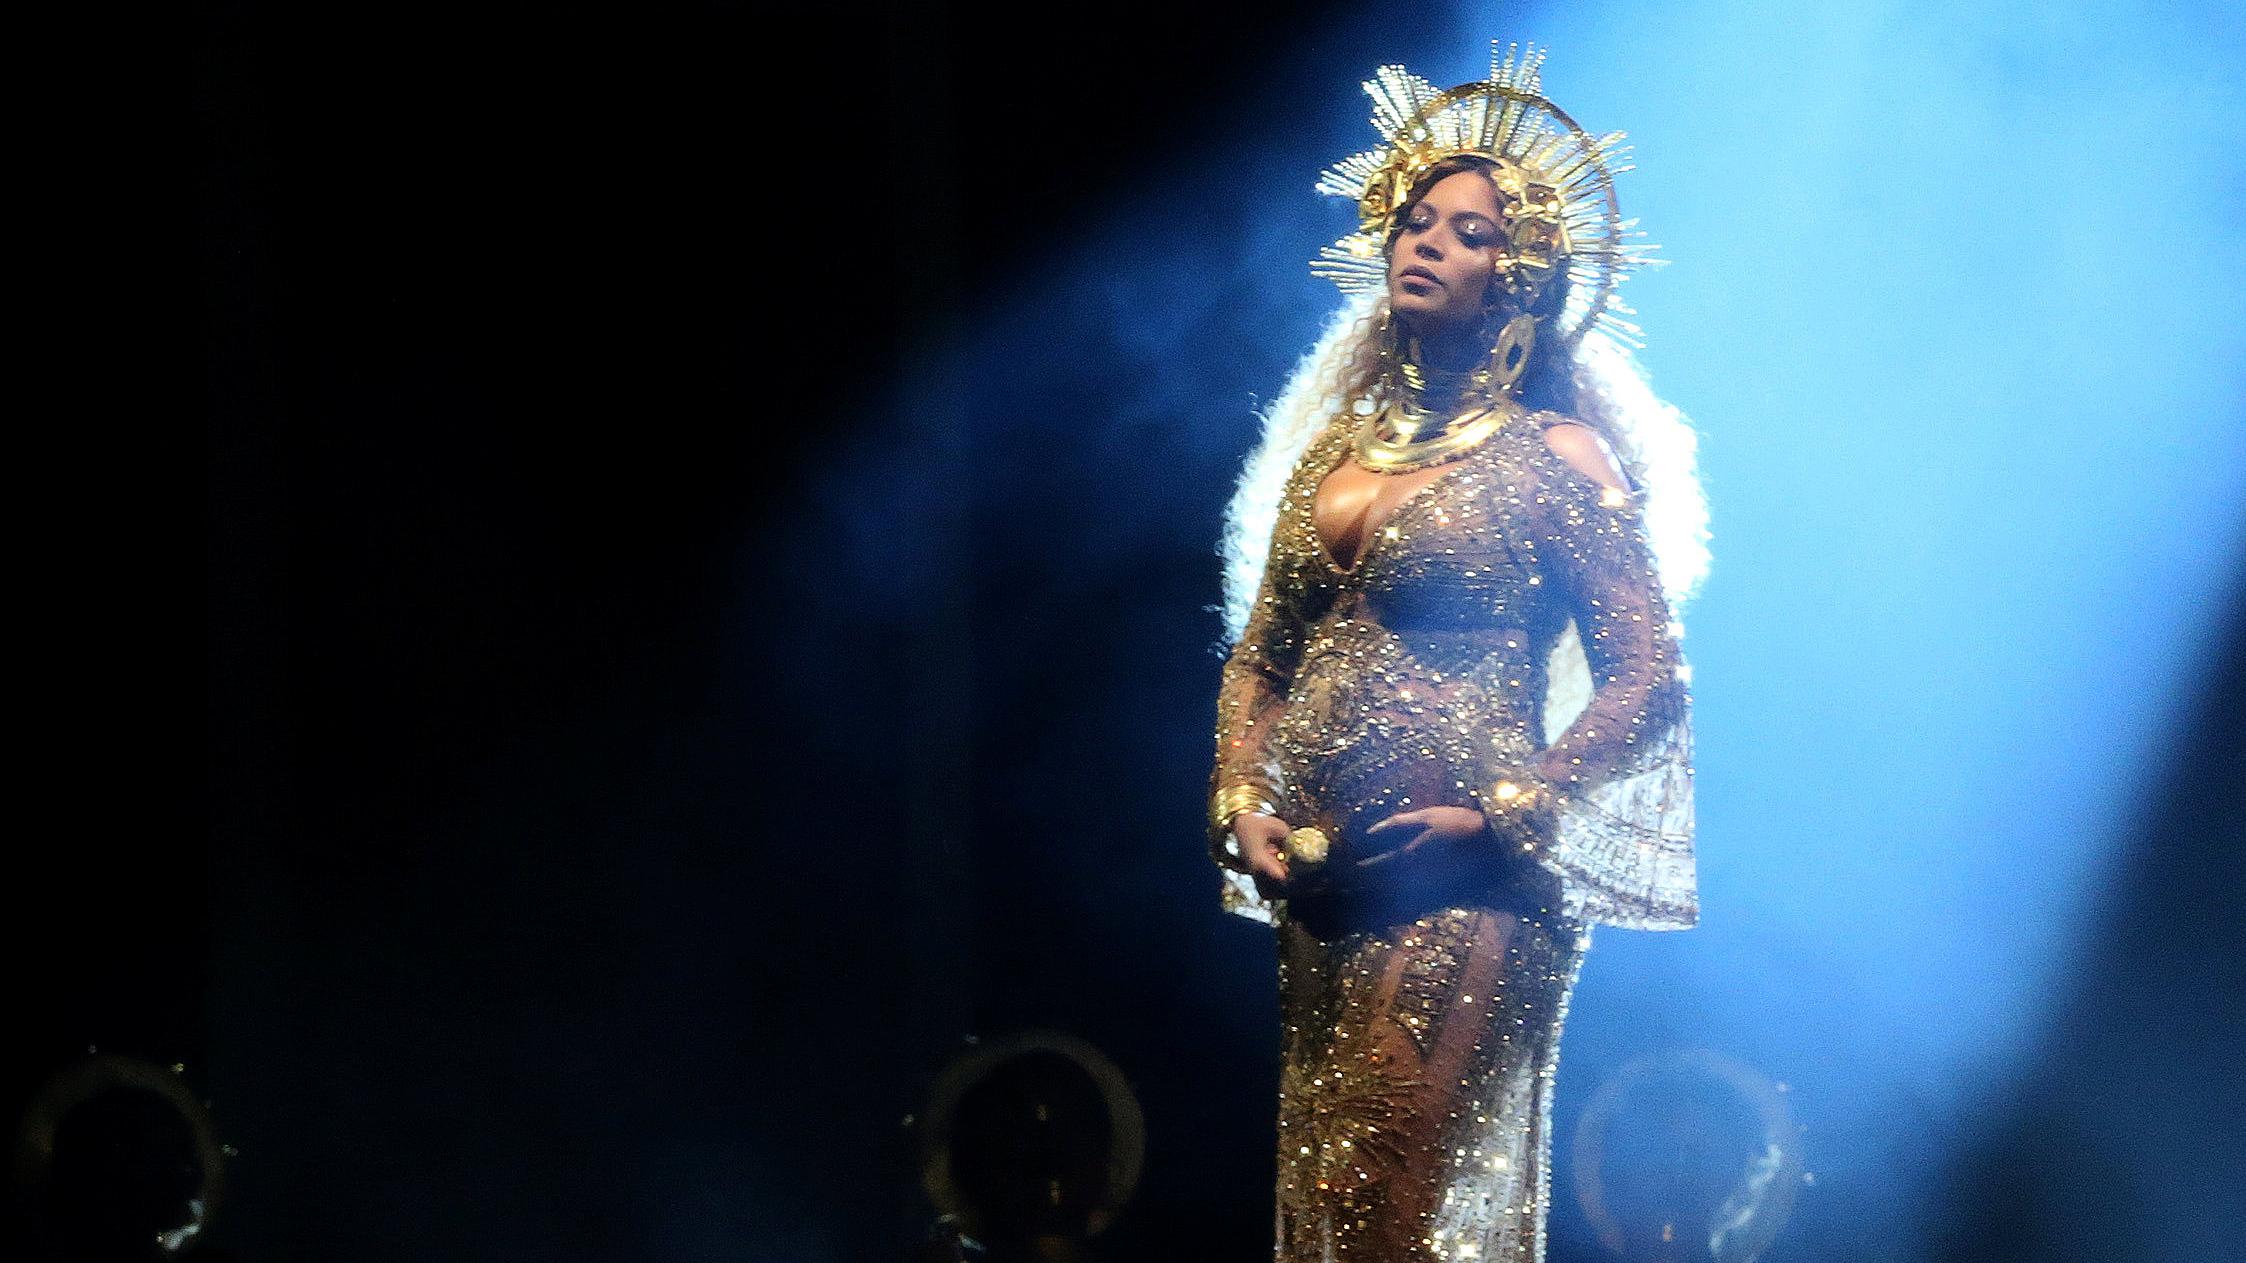 ef1e938107df Explaining Beyoncé s public performance of pregnancy and motherhood